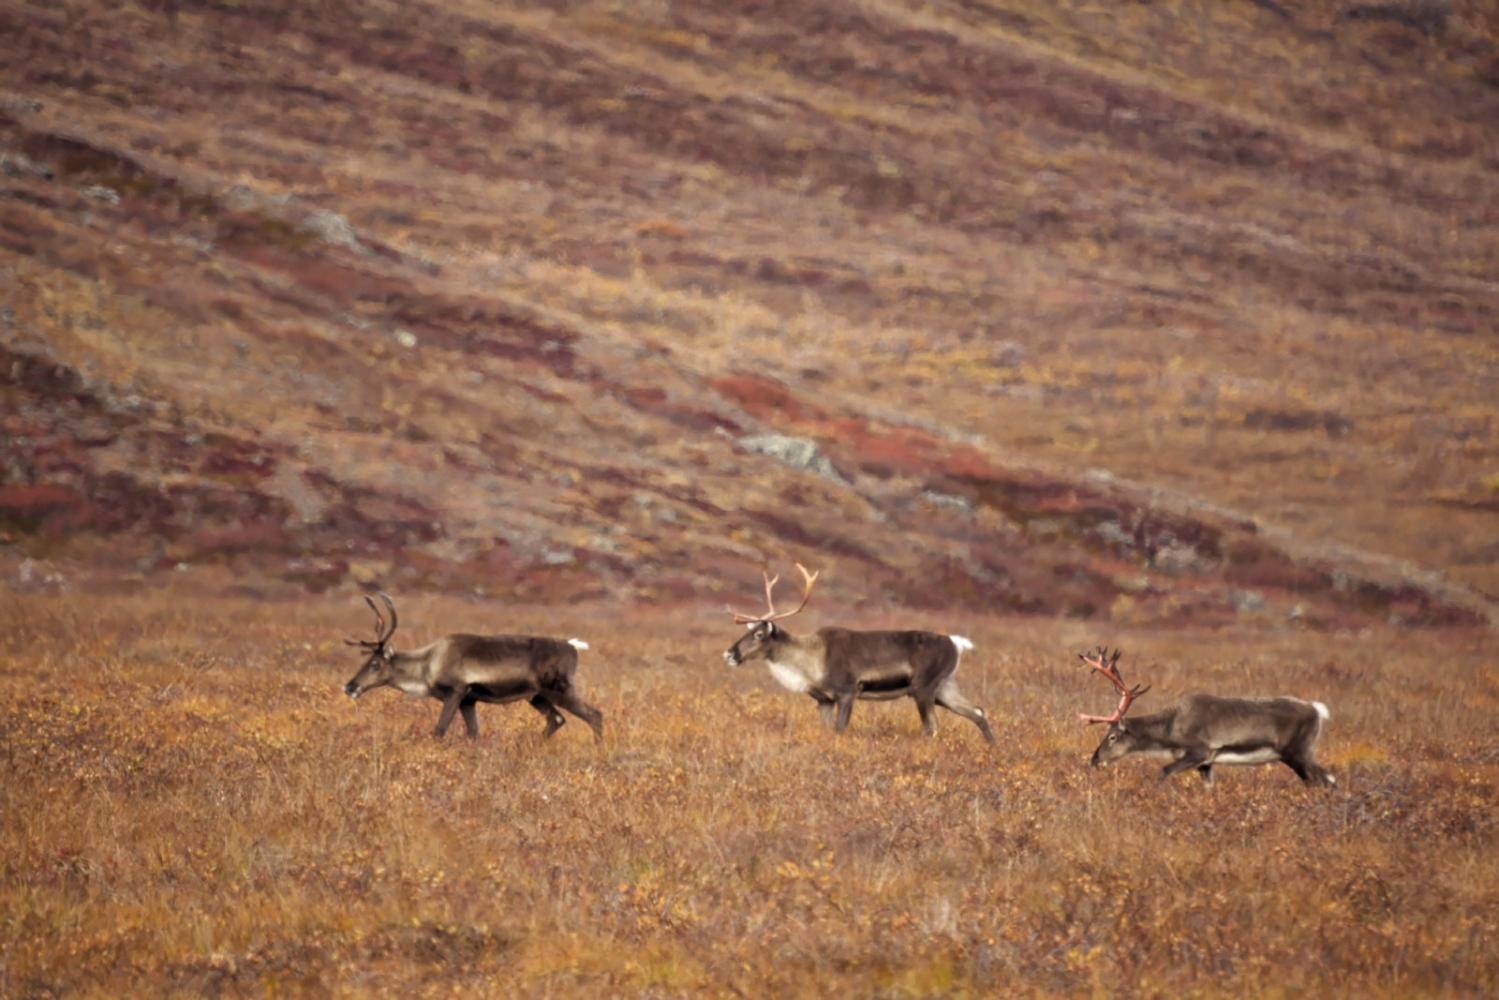 Art and Documentary Photography - Loading Rakesh-Gates-of-the-Arctic0001_DxO.jpg